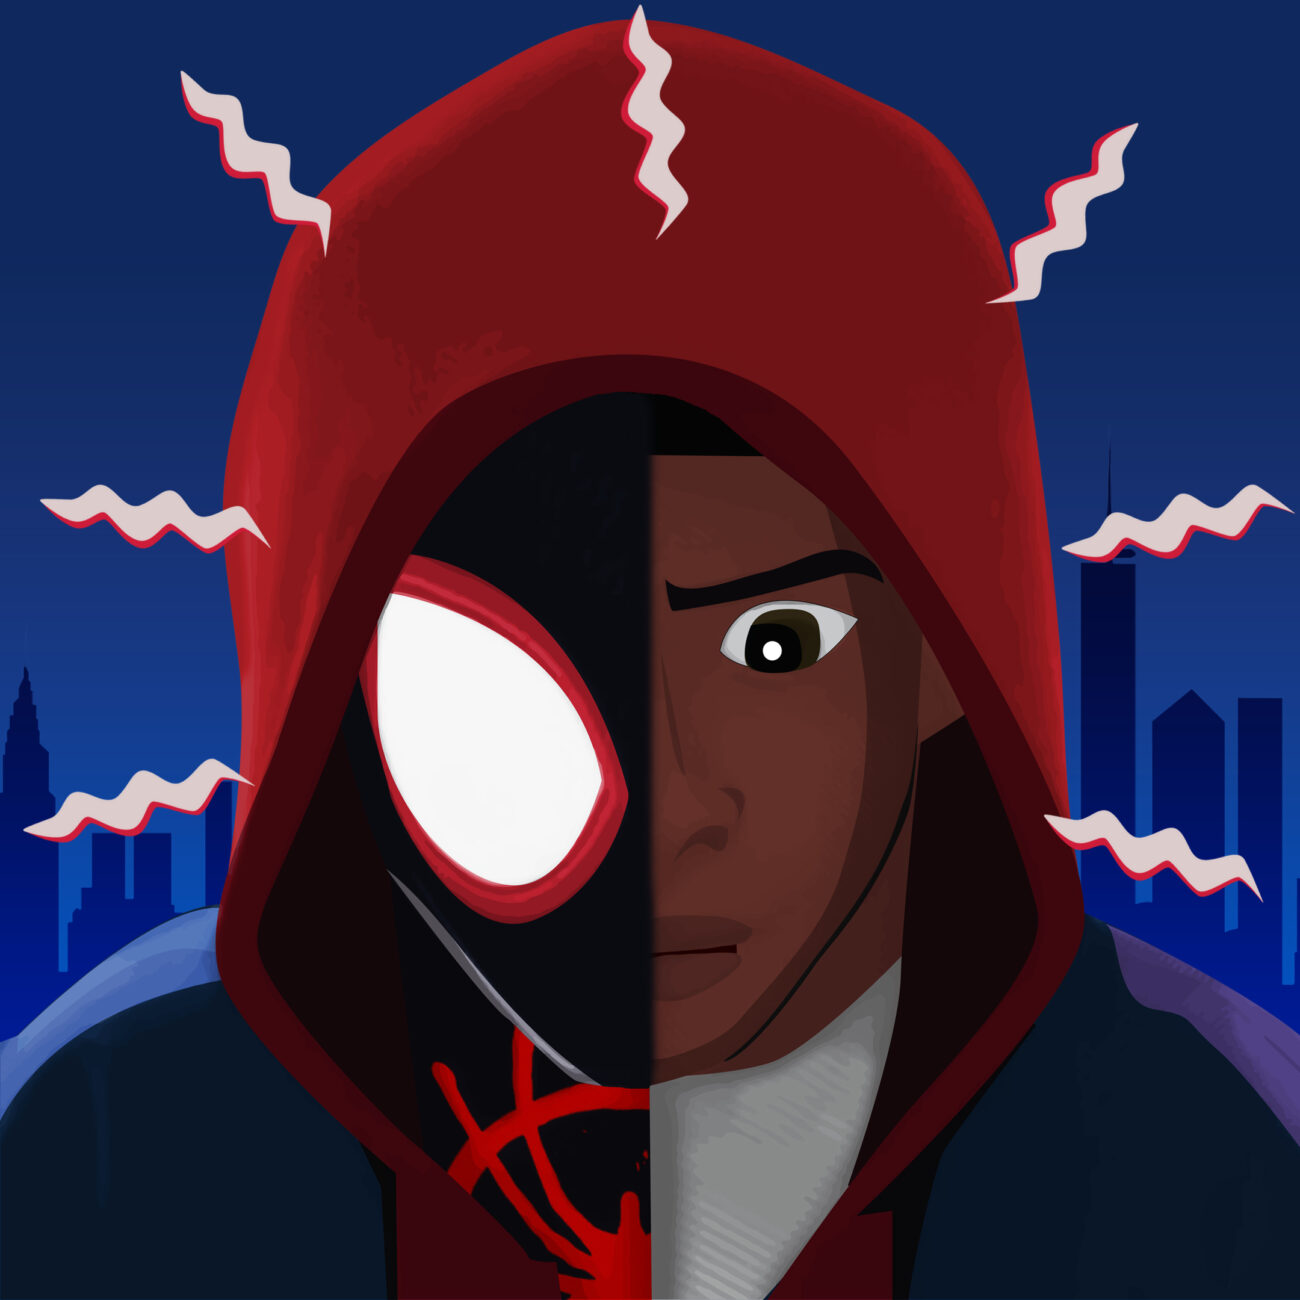 Spiderman_Miles_Final_2